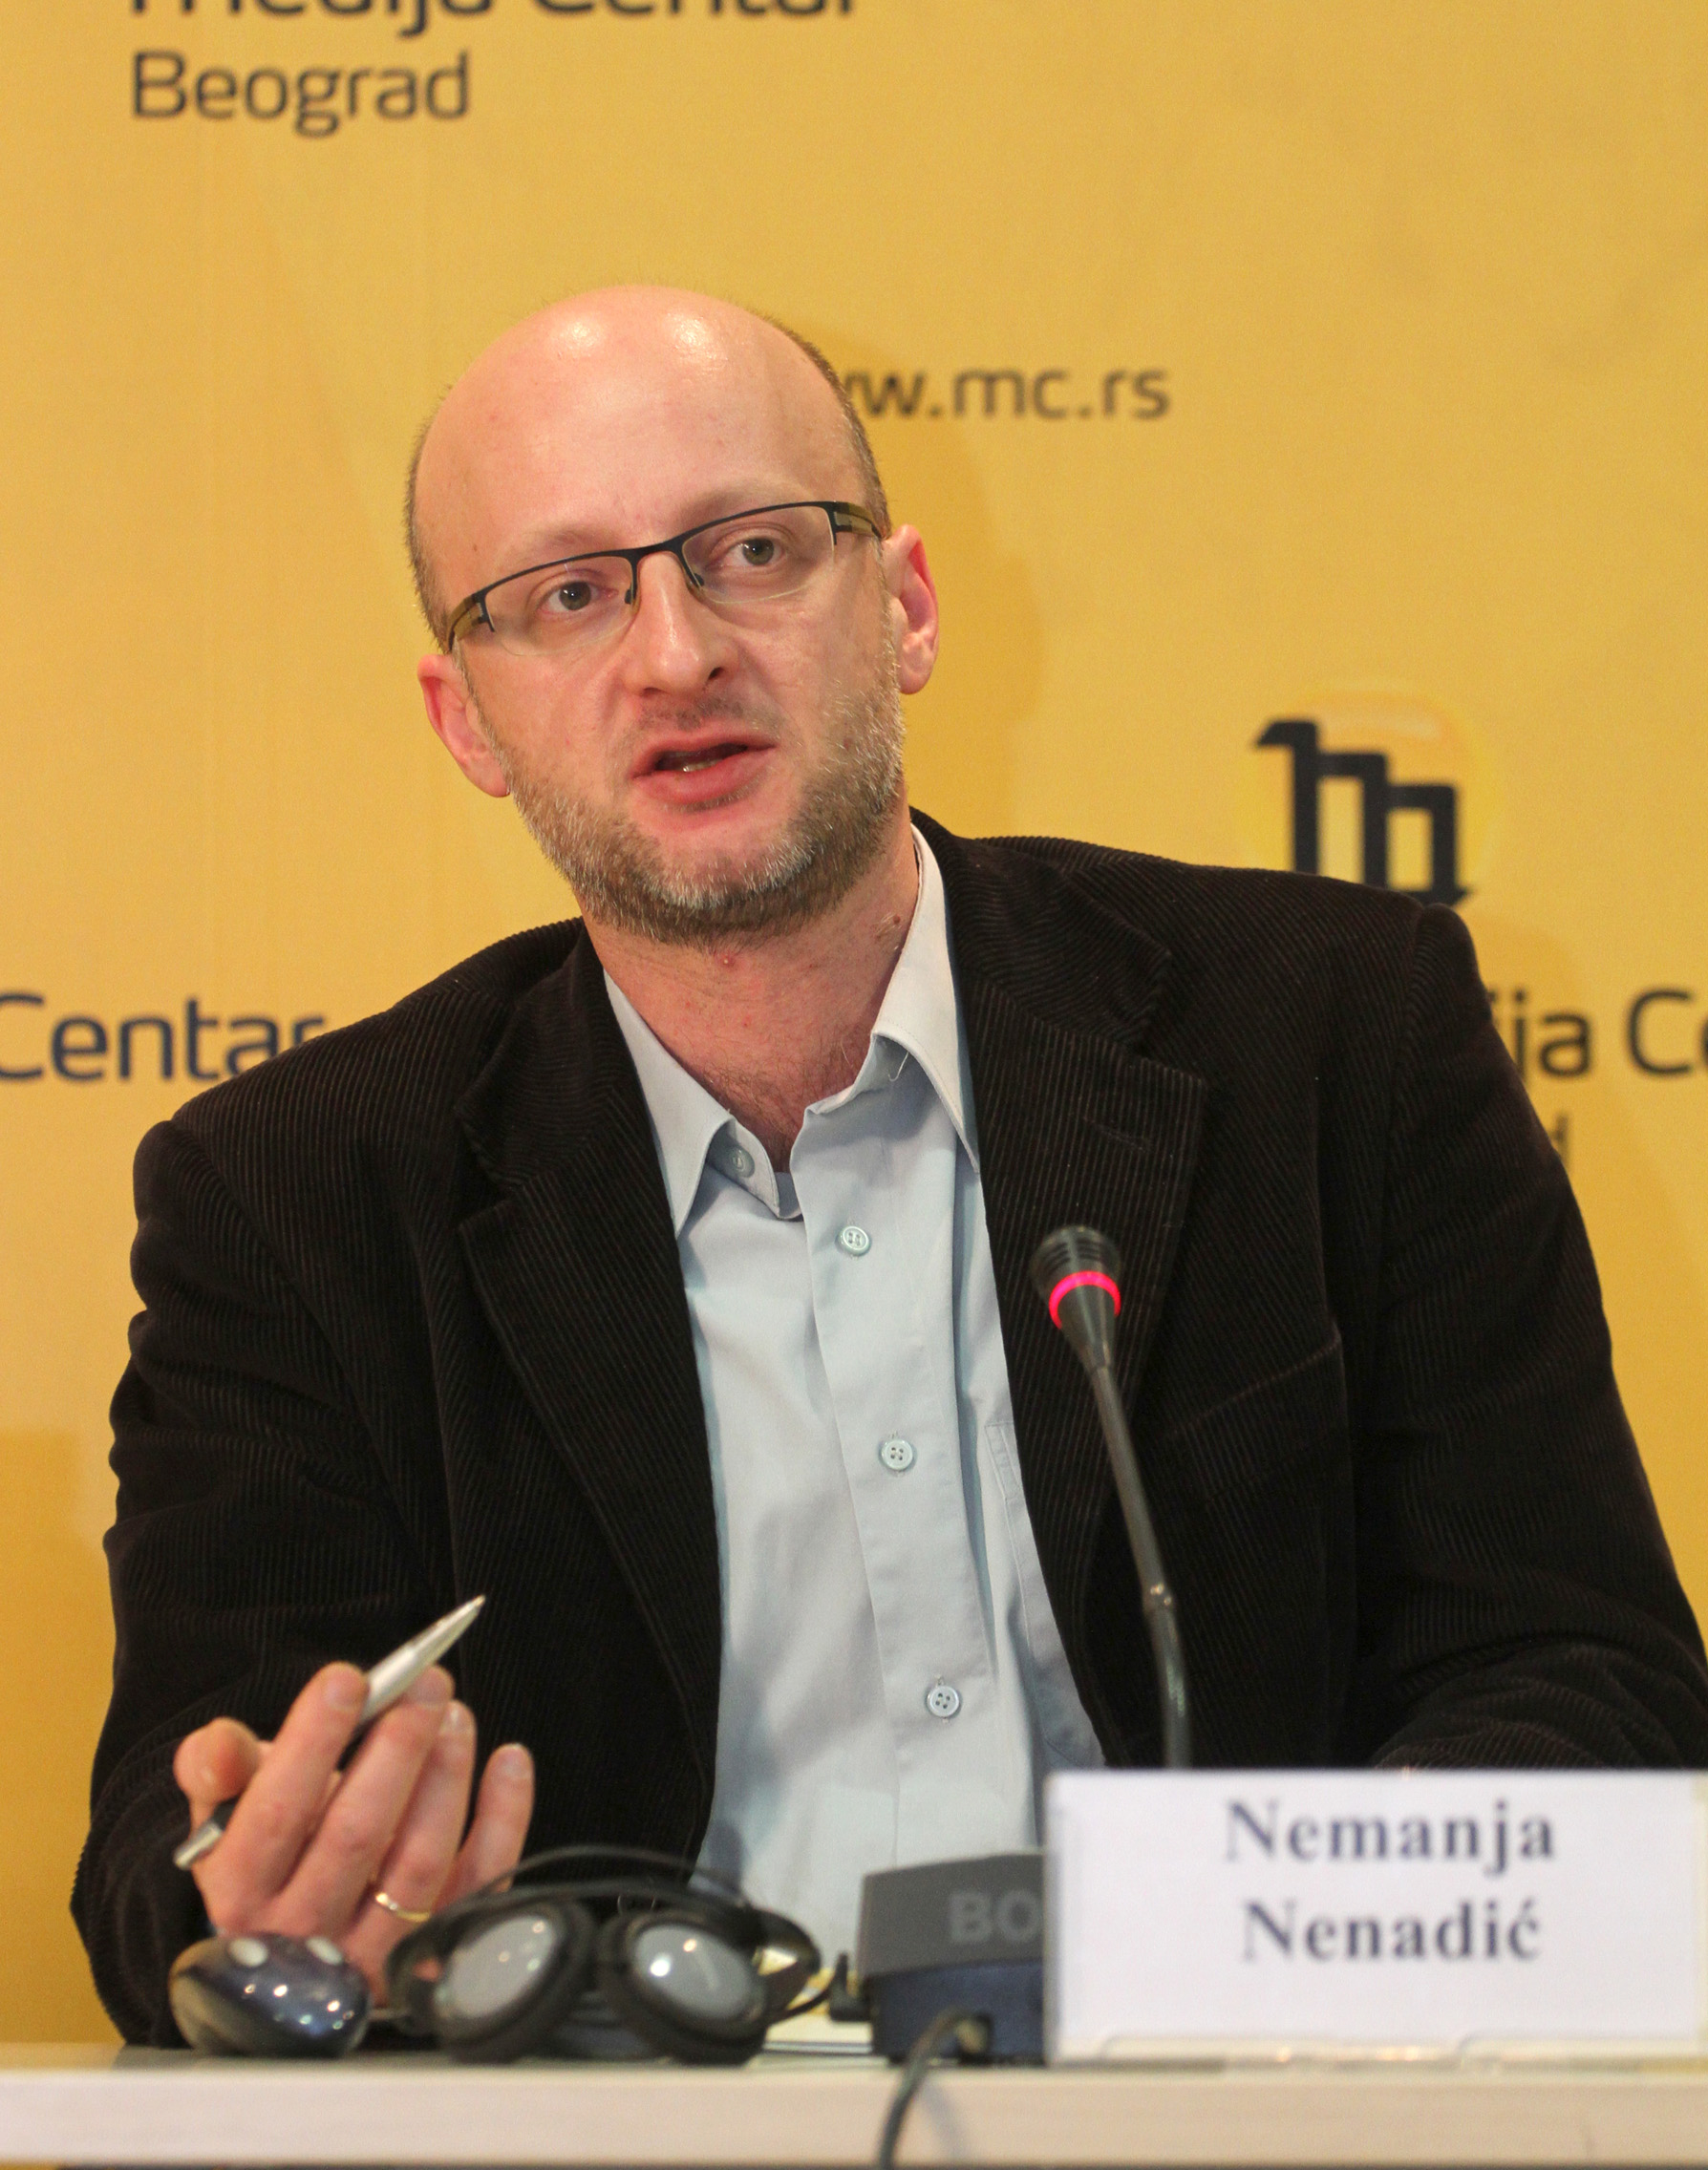 Резултат слика за Nemanja Nenadić srbija